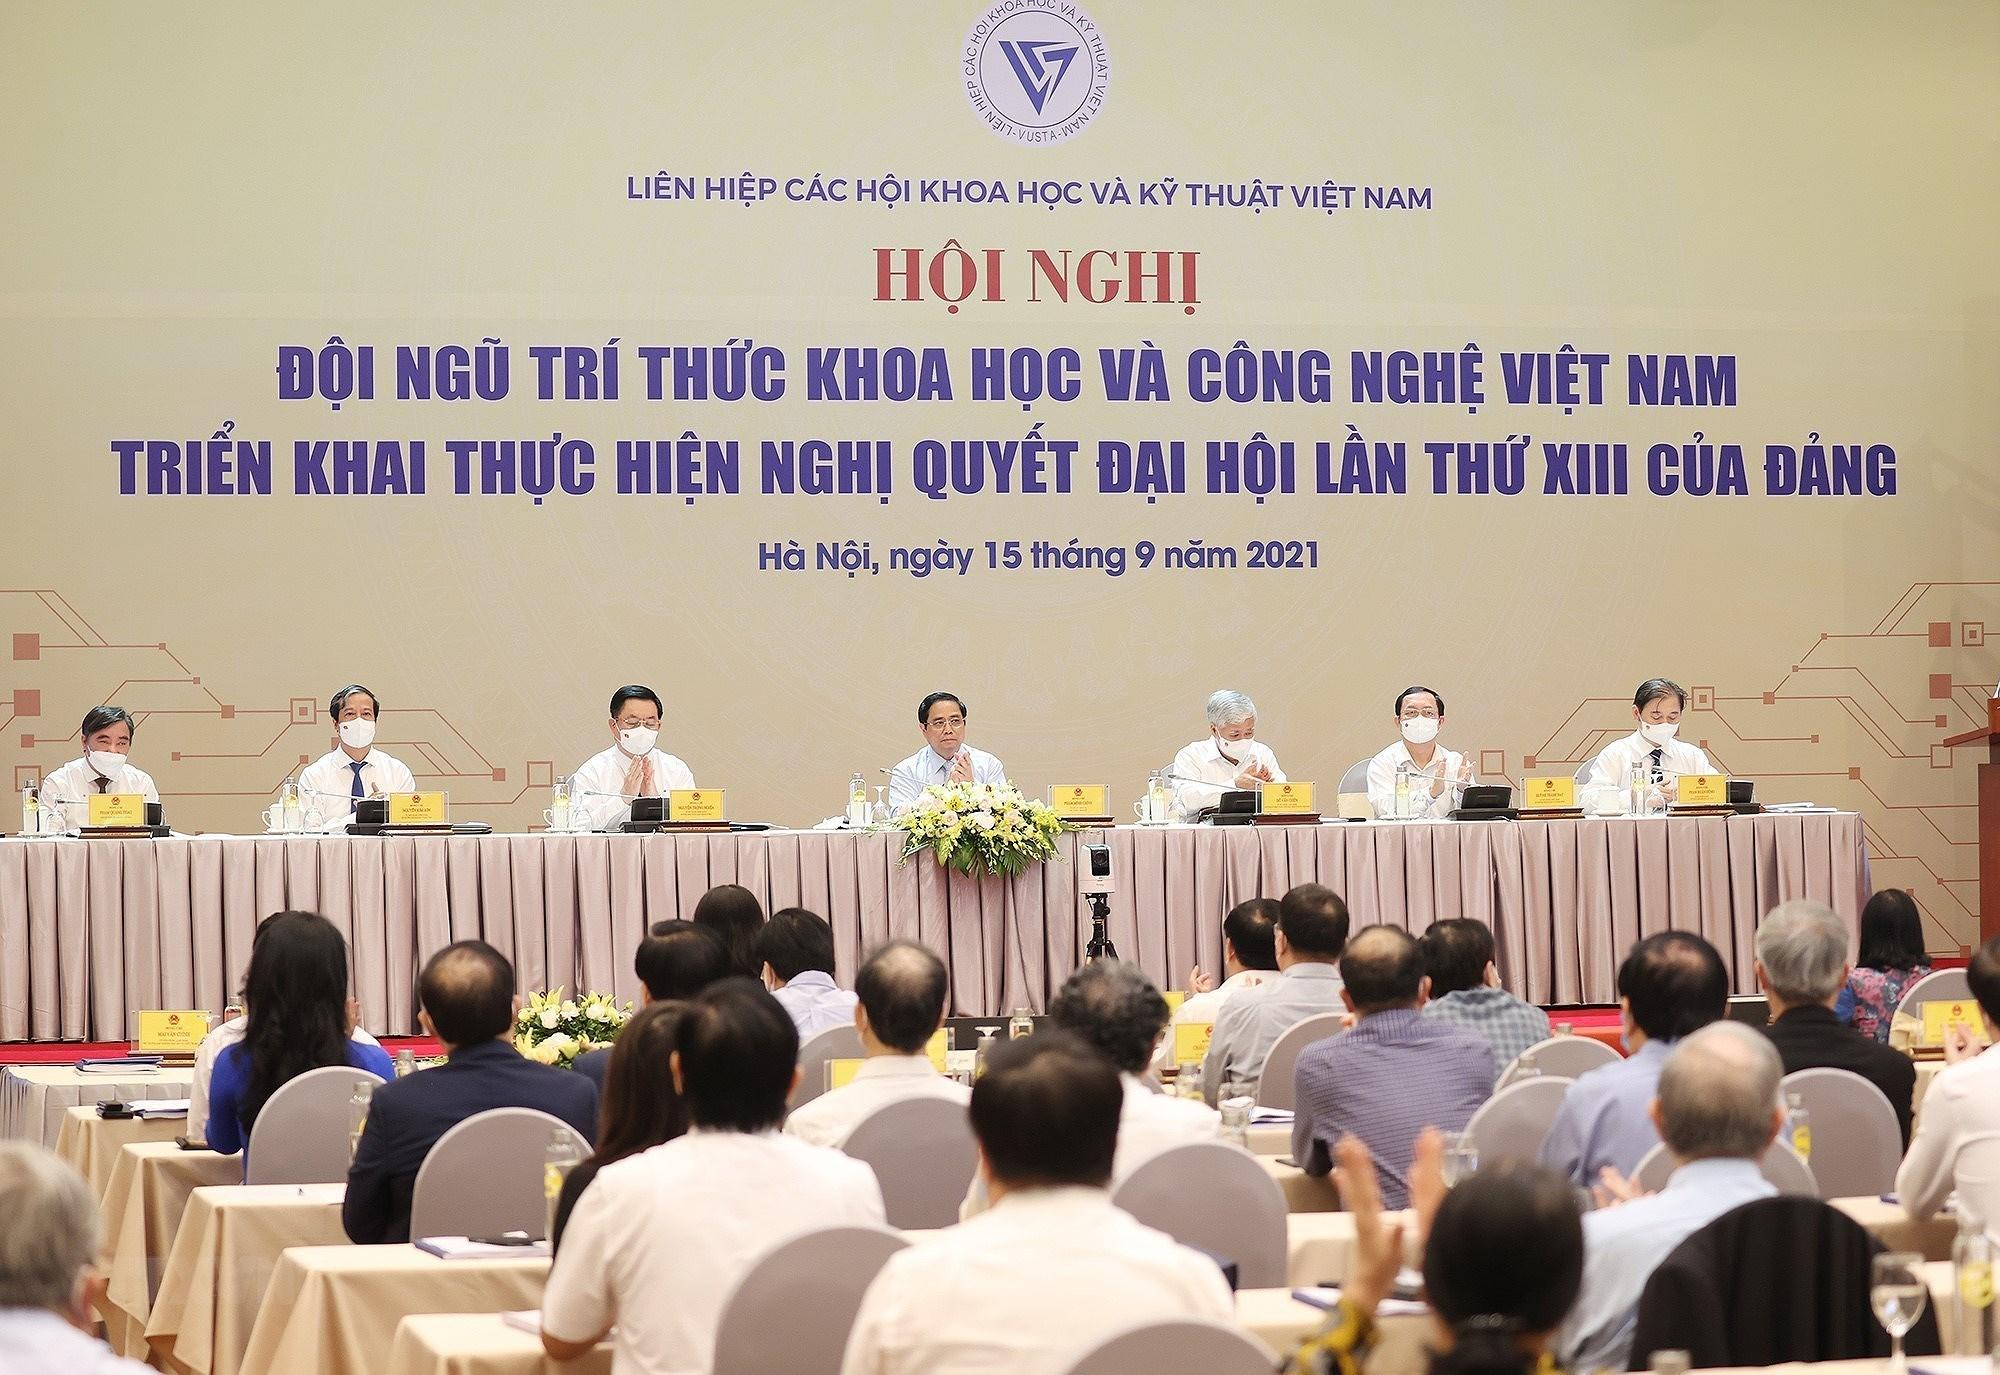 Thu tuong du Hoi nghi doi ngu tri thuc khoa hoc va cong nghe Viet Nam hinh anh 3